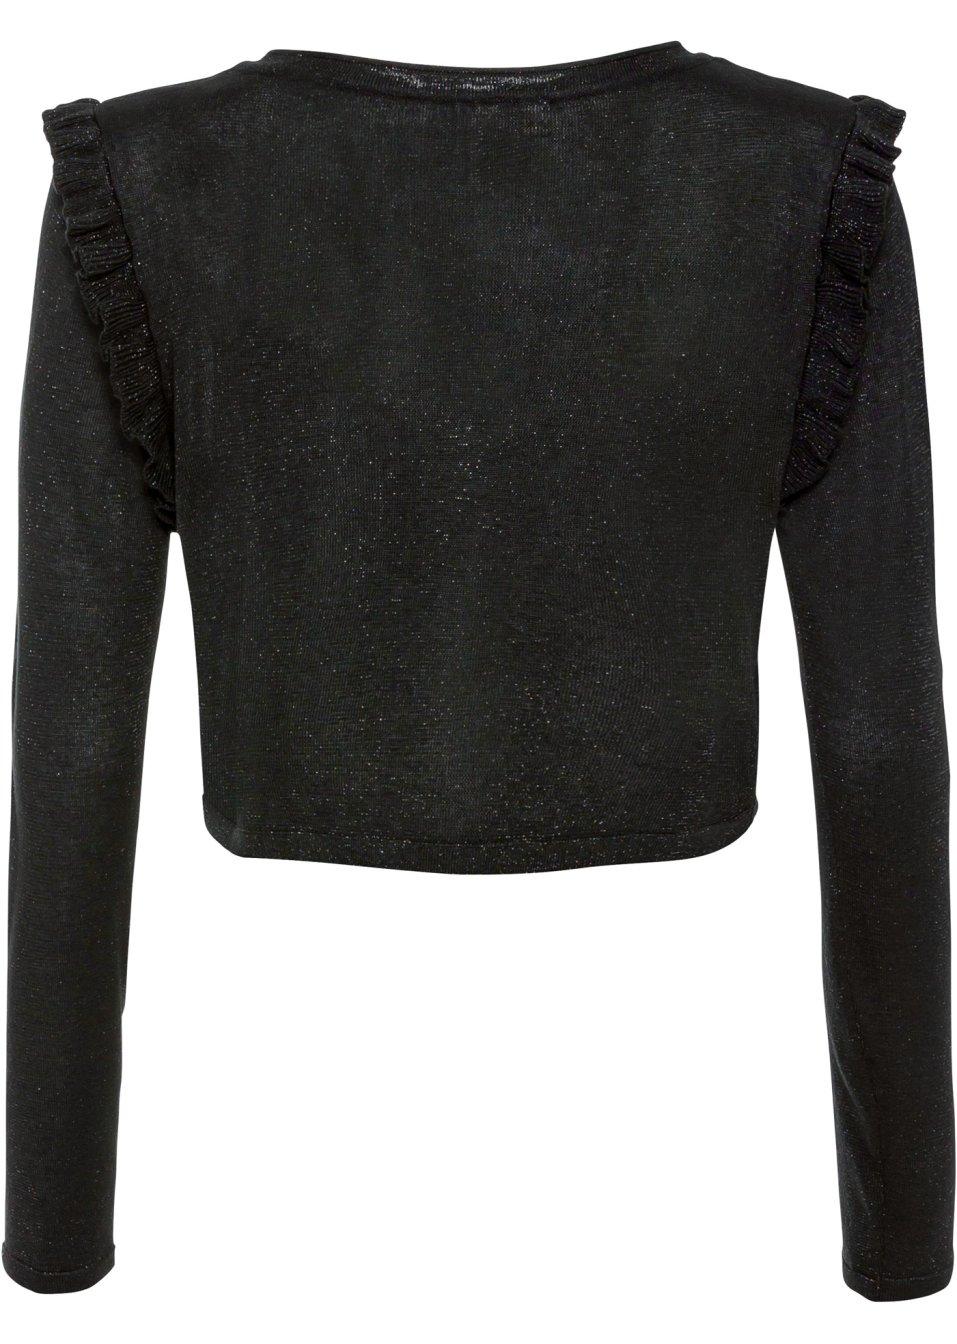 Mode Femme Vêtements DJLfdOFlkj Boléro en maille pailletée noir Femme BODYFLIRT boutique .fr